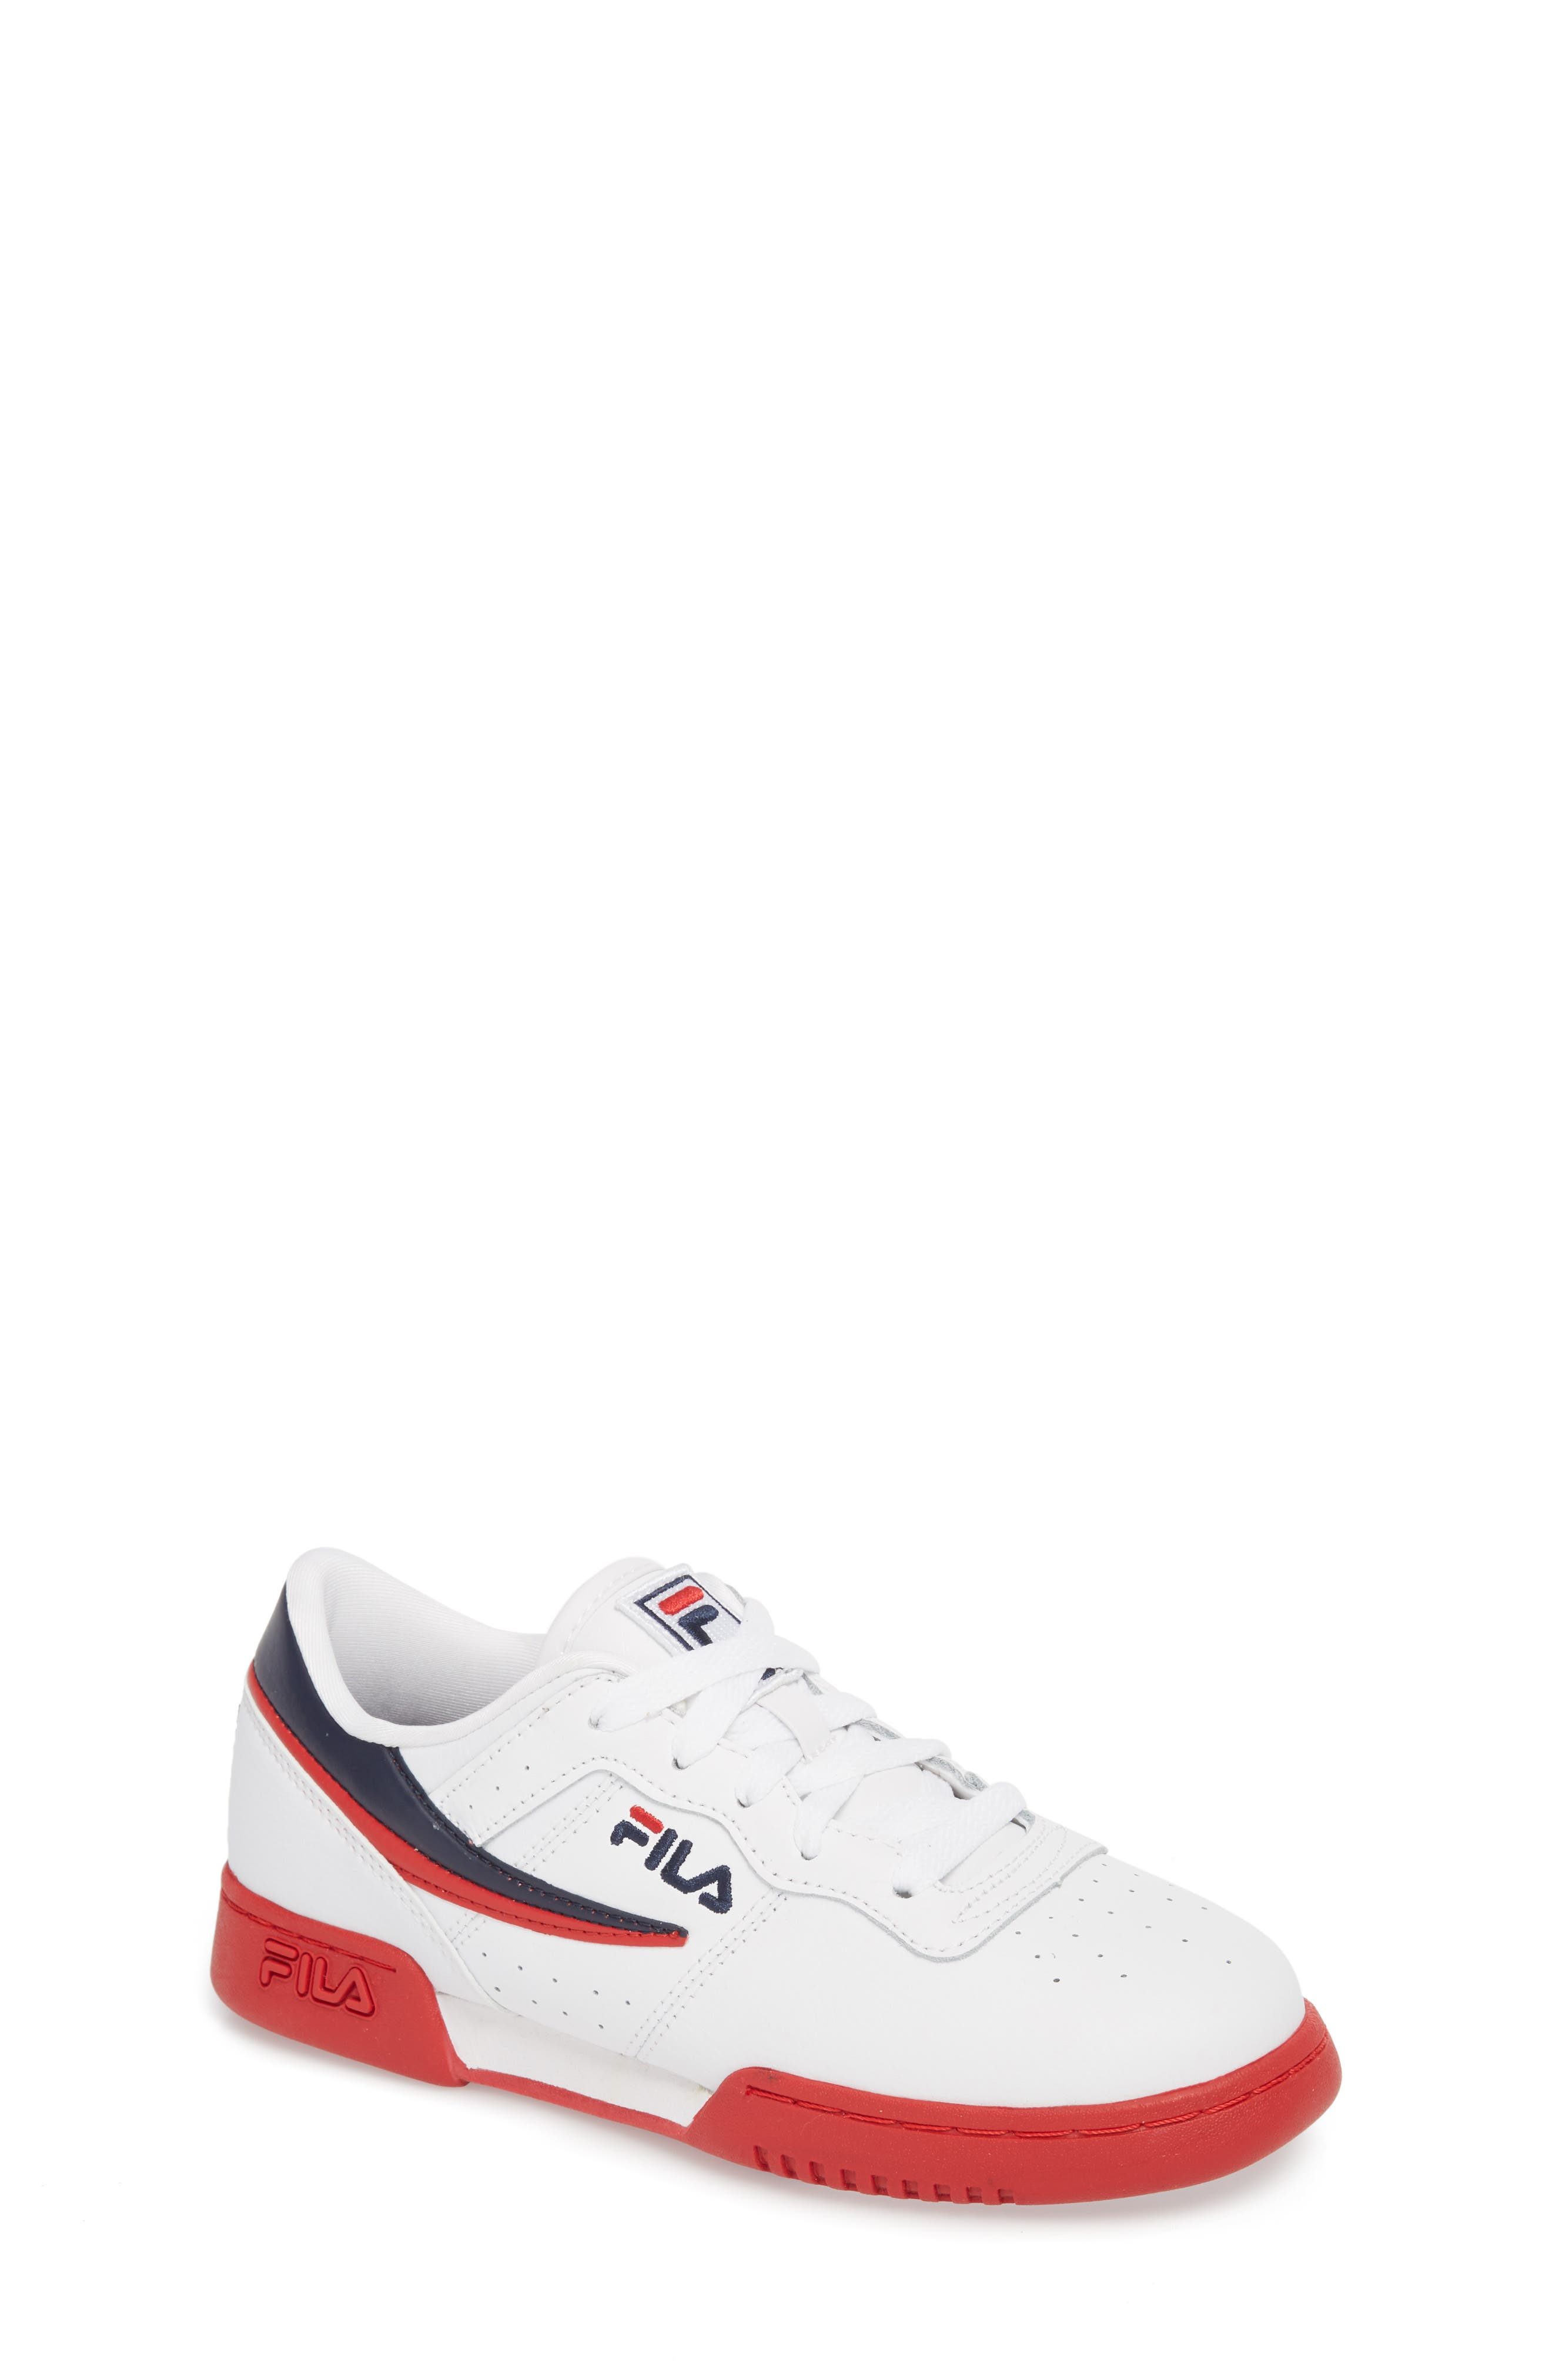 Original Fitness Sneaker,                         Main,                         color, WHITE/ FILA RED